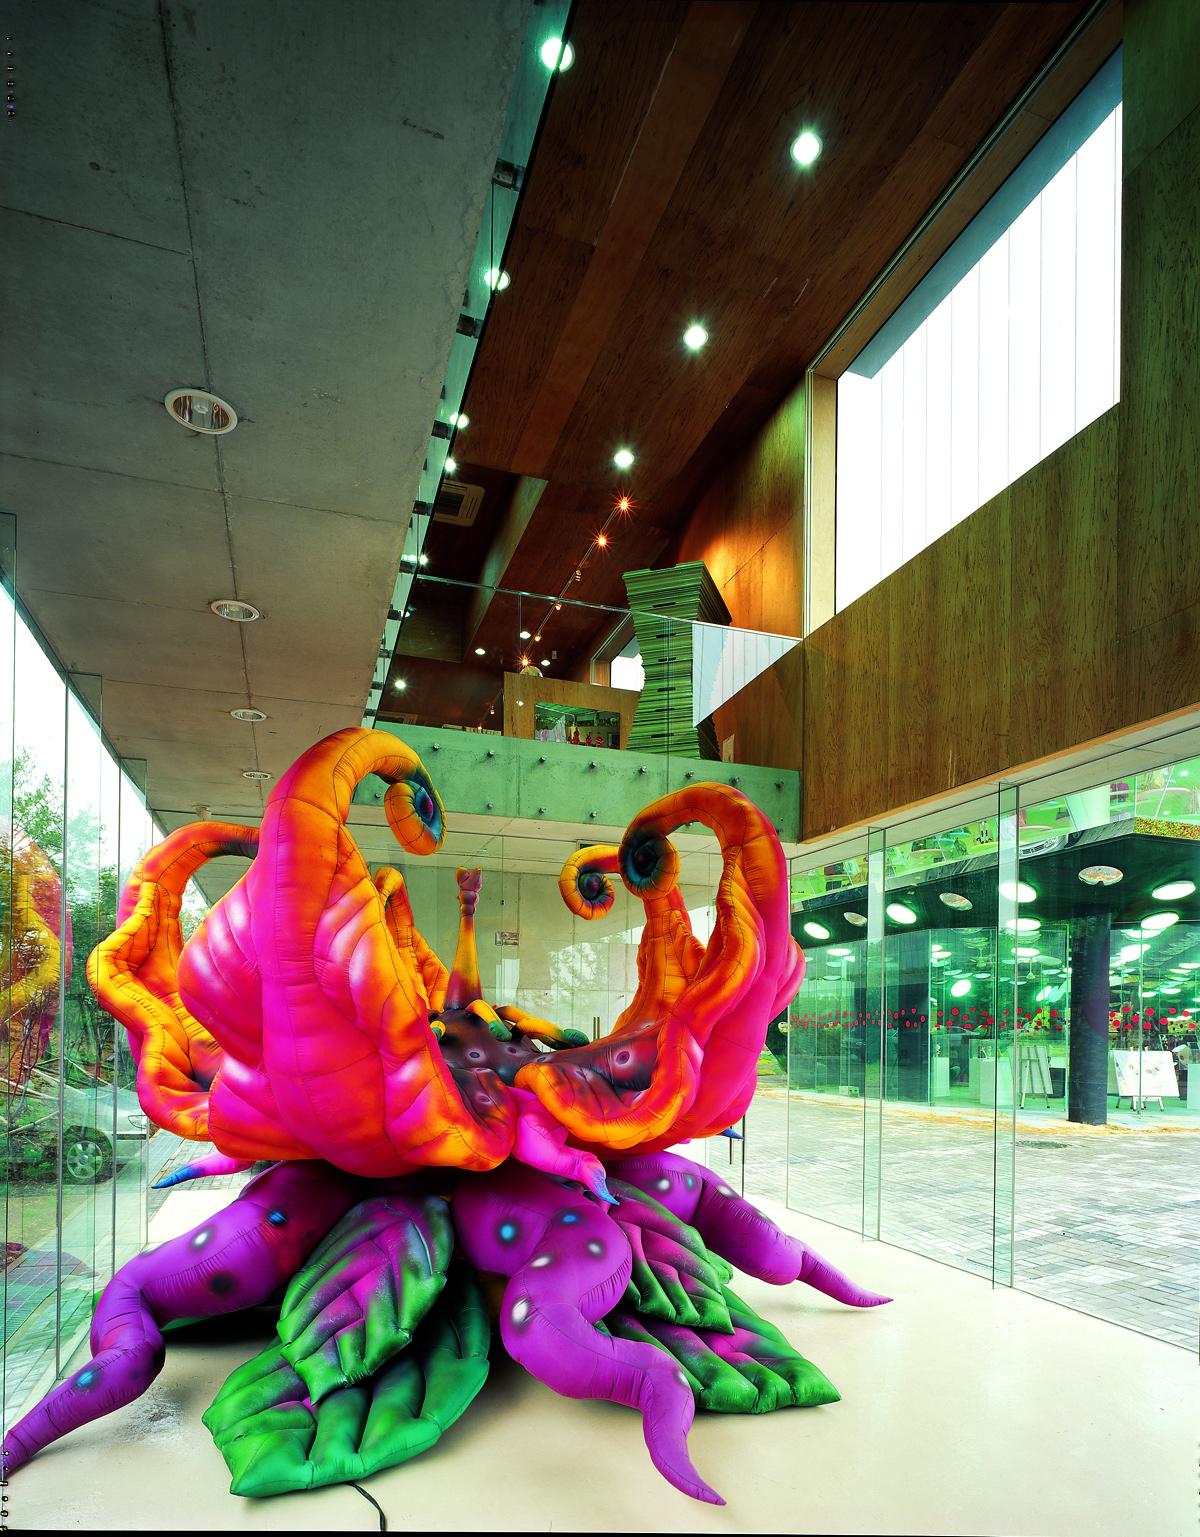 Art warehouse-06.jpg